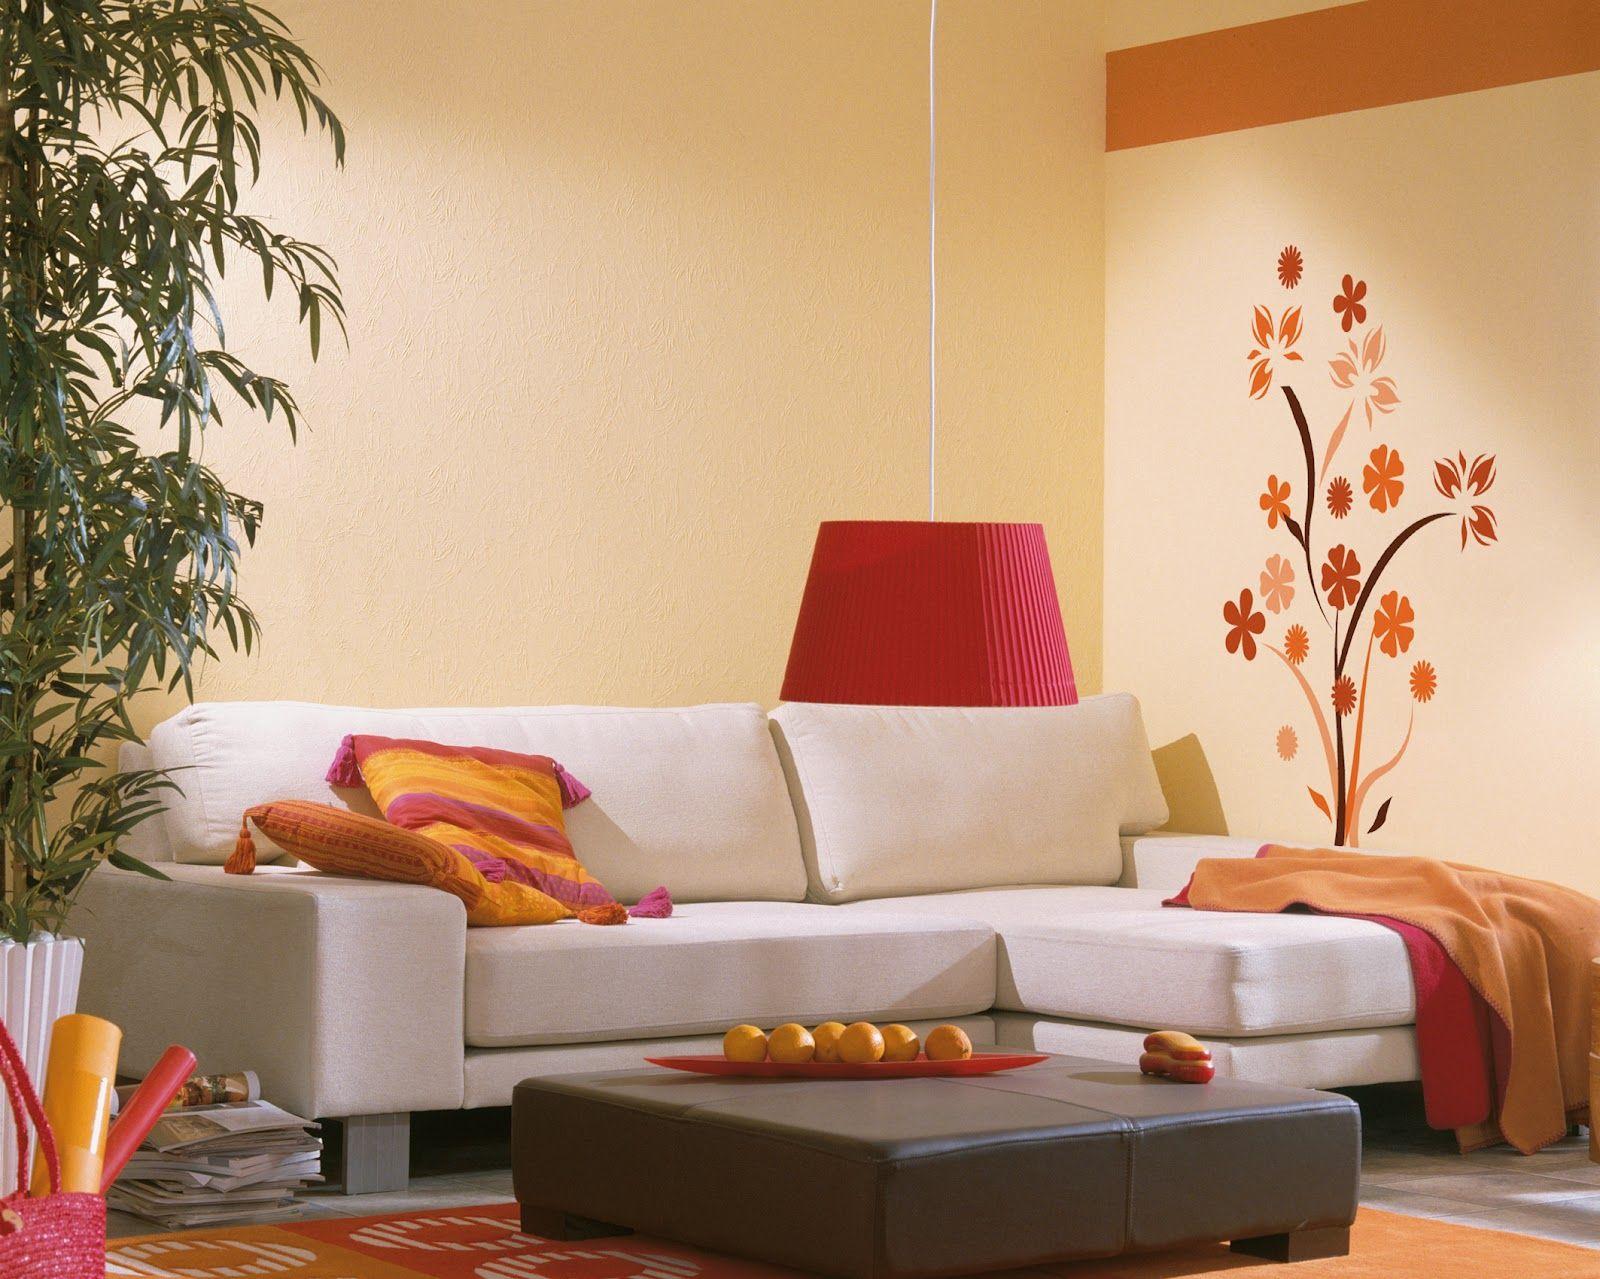 Pin de glory en casa dulce hogar | Pinterest | Vinil, Colgantes y ...